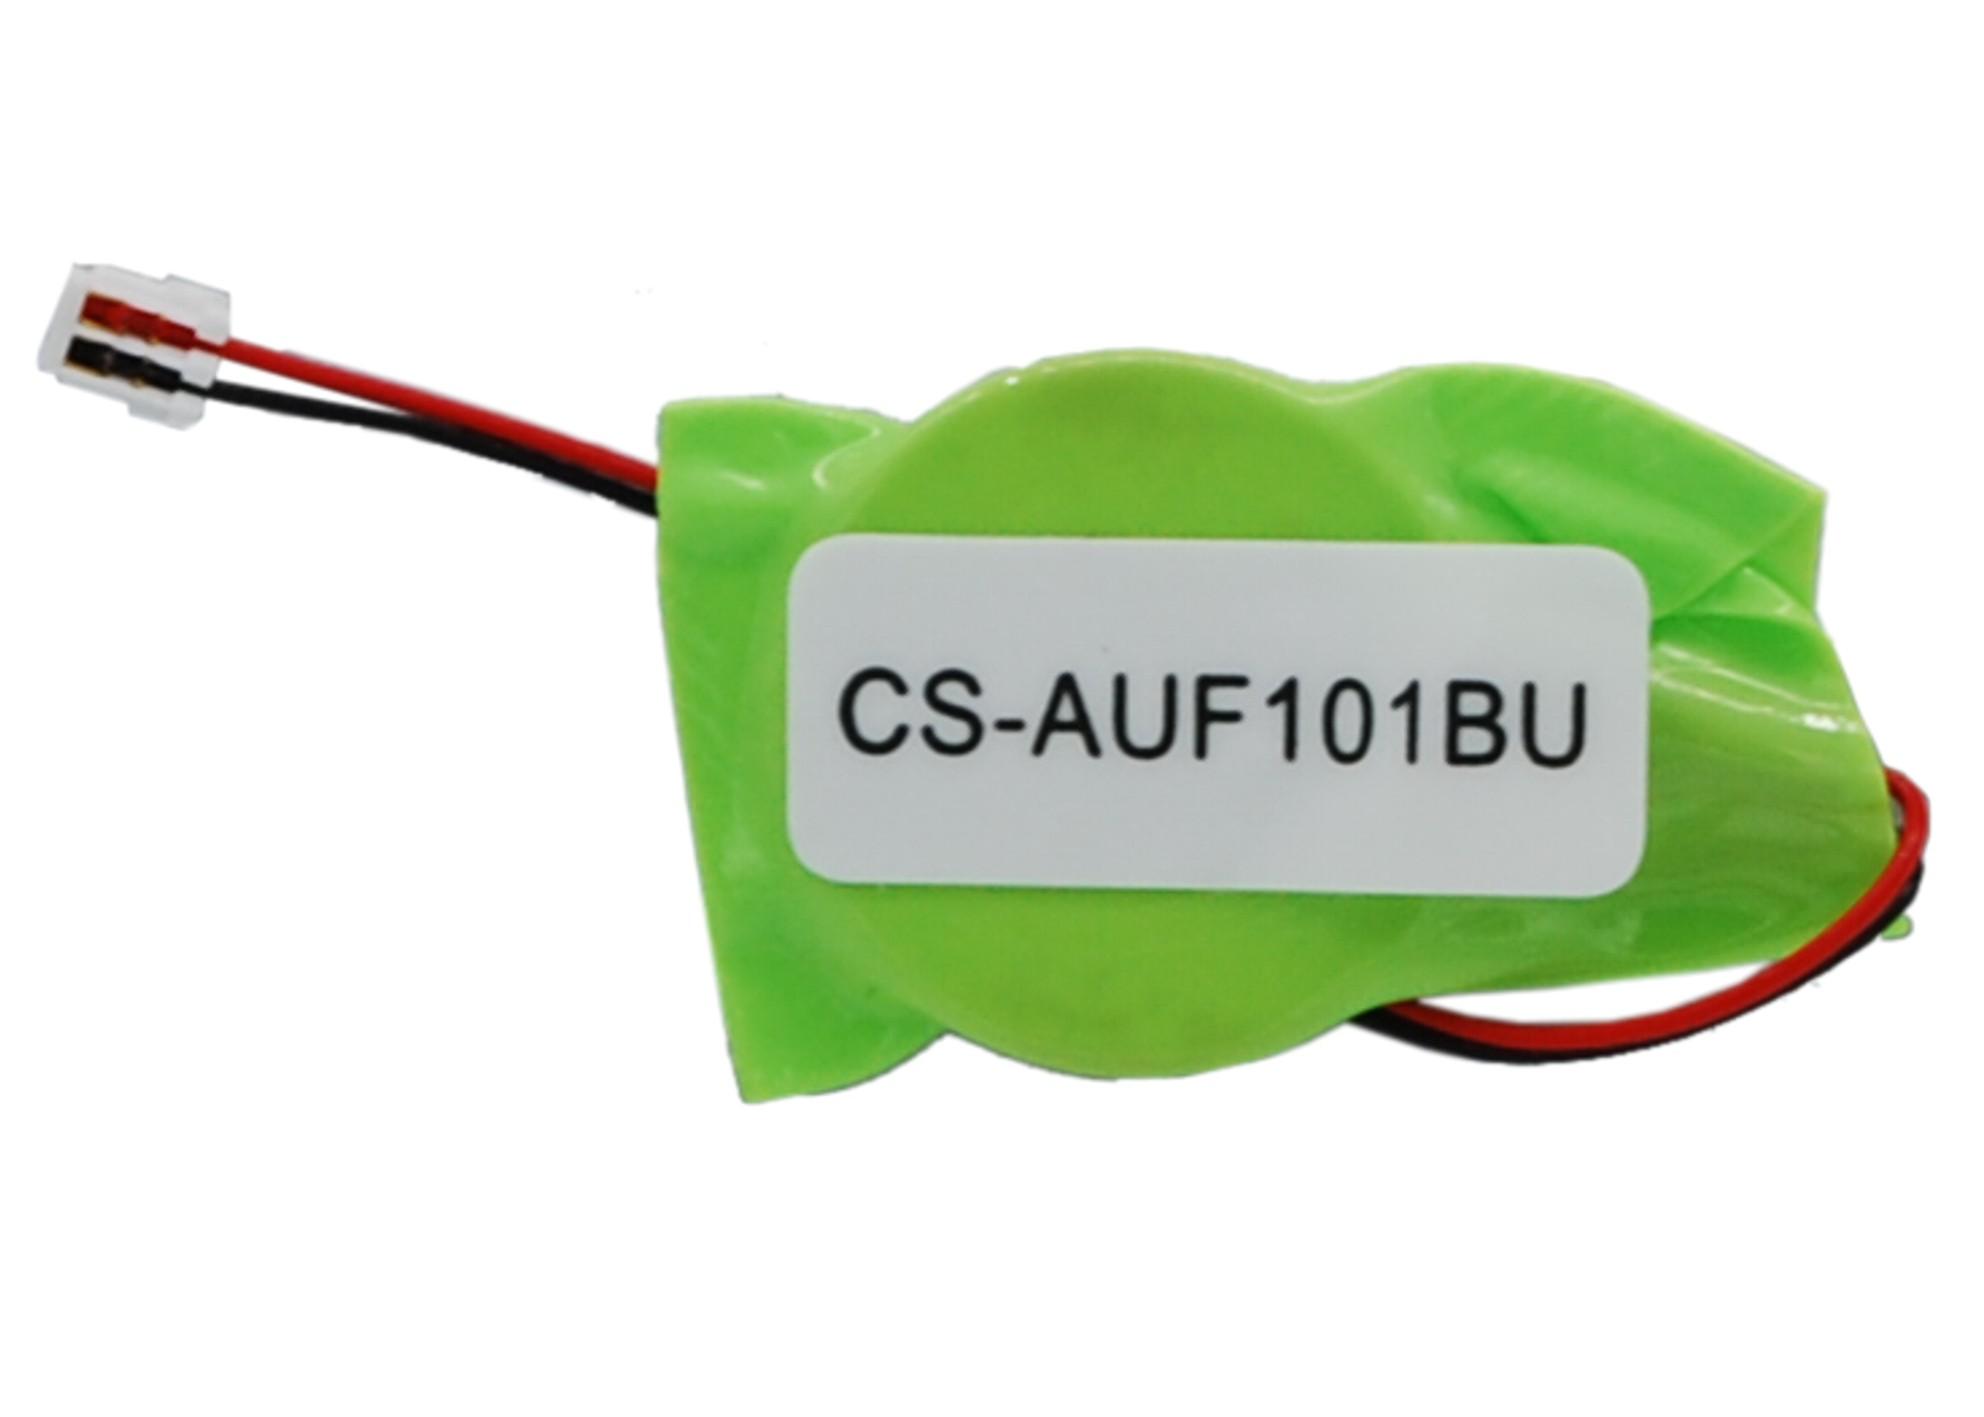 Cameron Sino baterie cmos pro ASUS Eee Pad Transformer TF101-1B030A 3V Li-ion 40mAh zelená - neoriginální